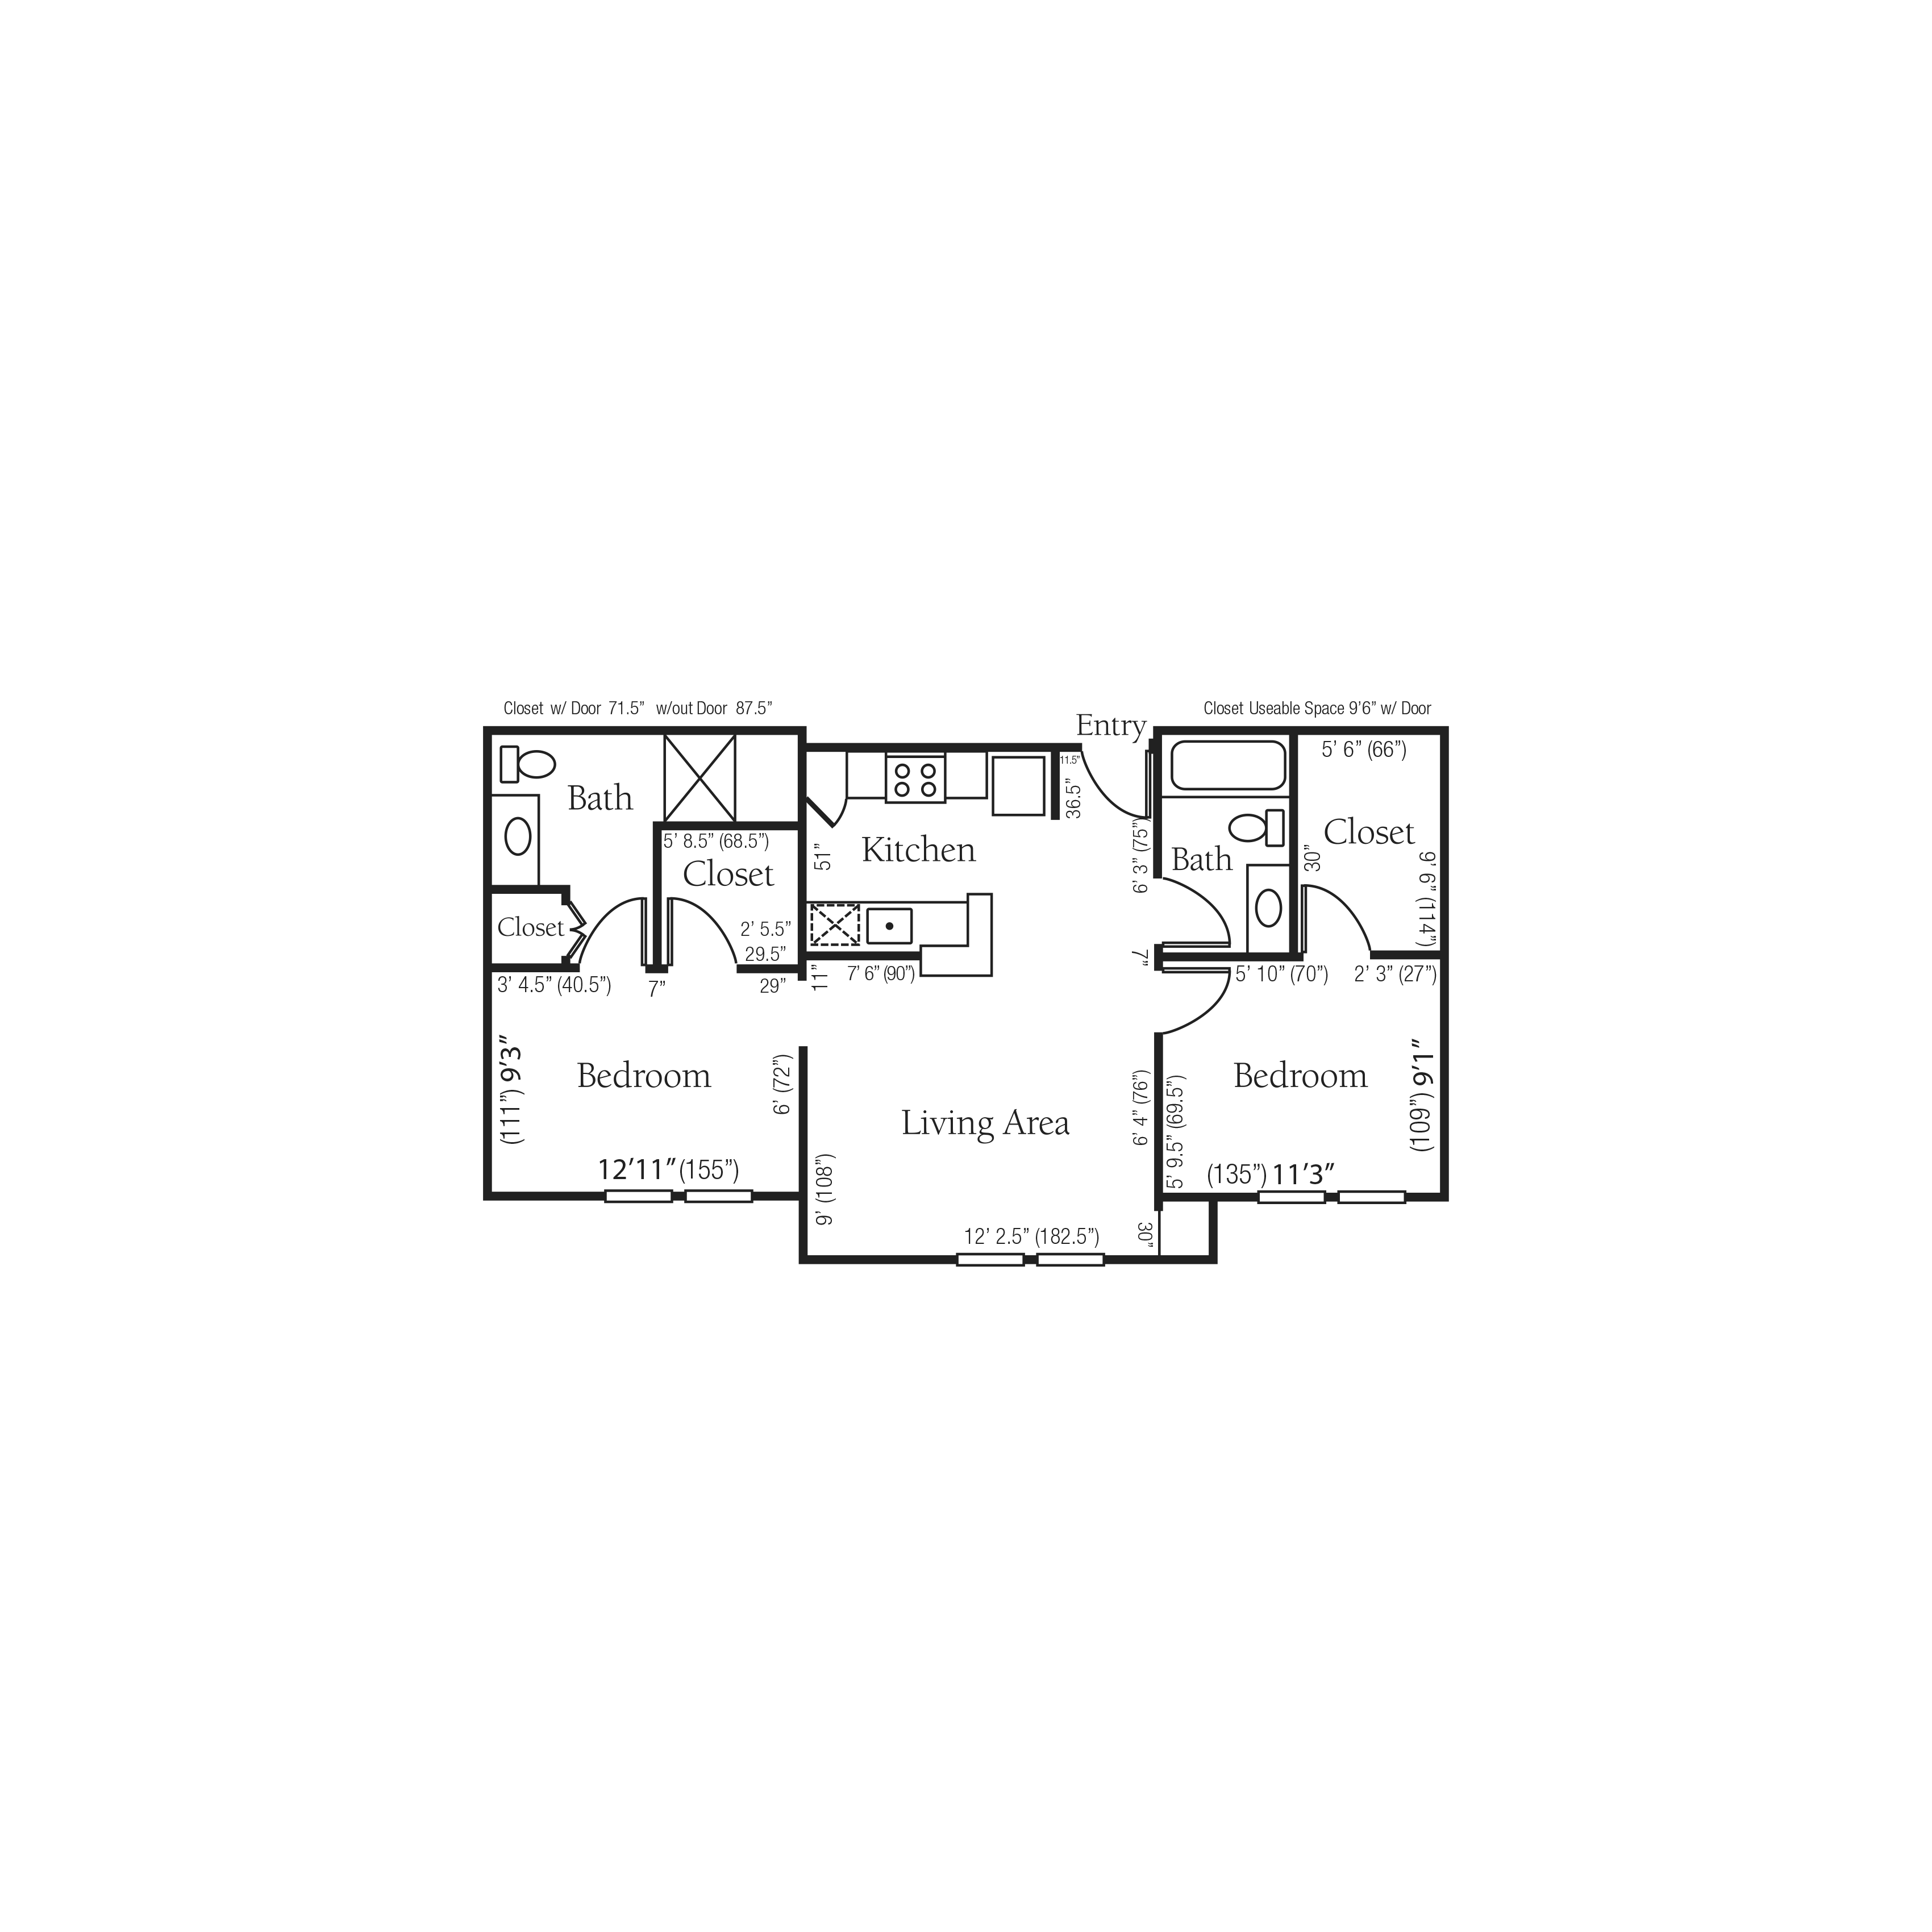 The Chadwick floor plan